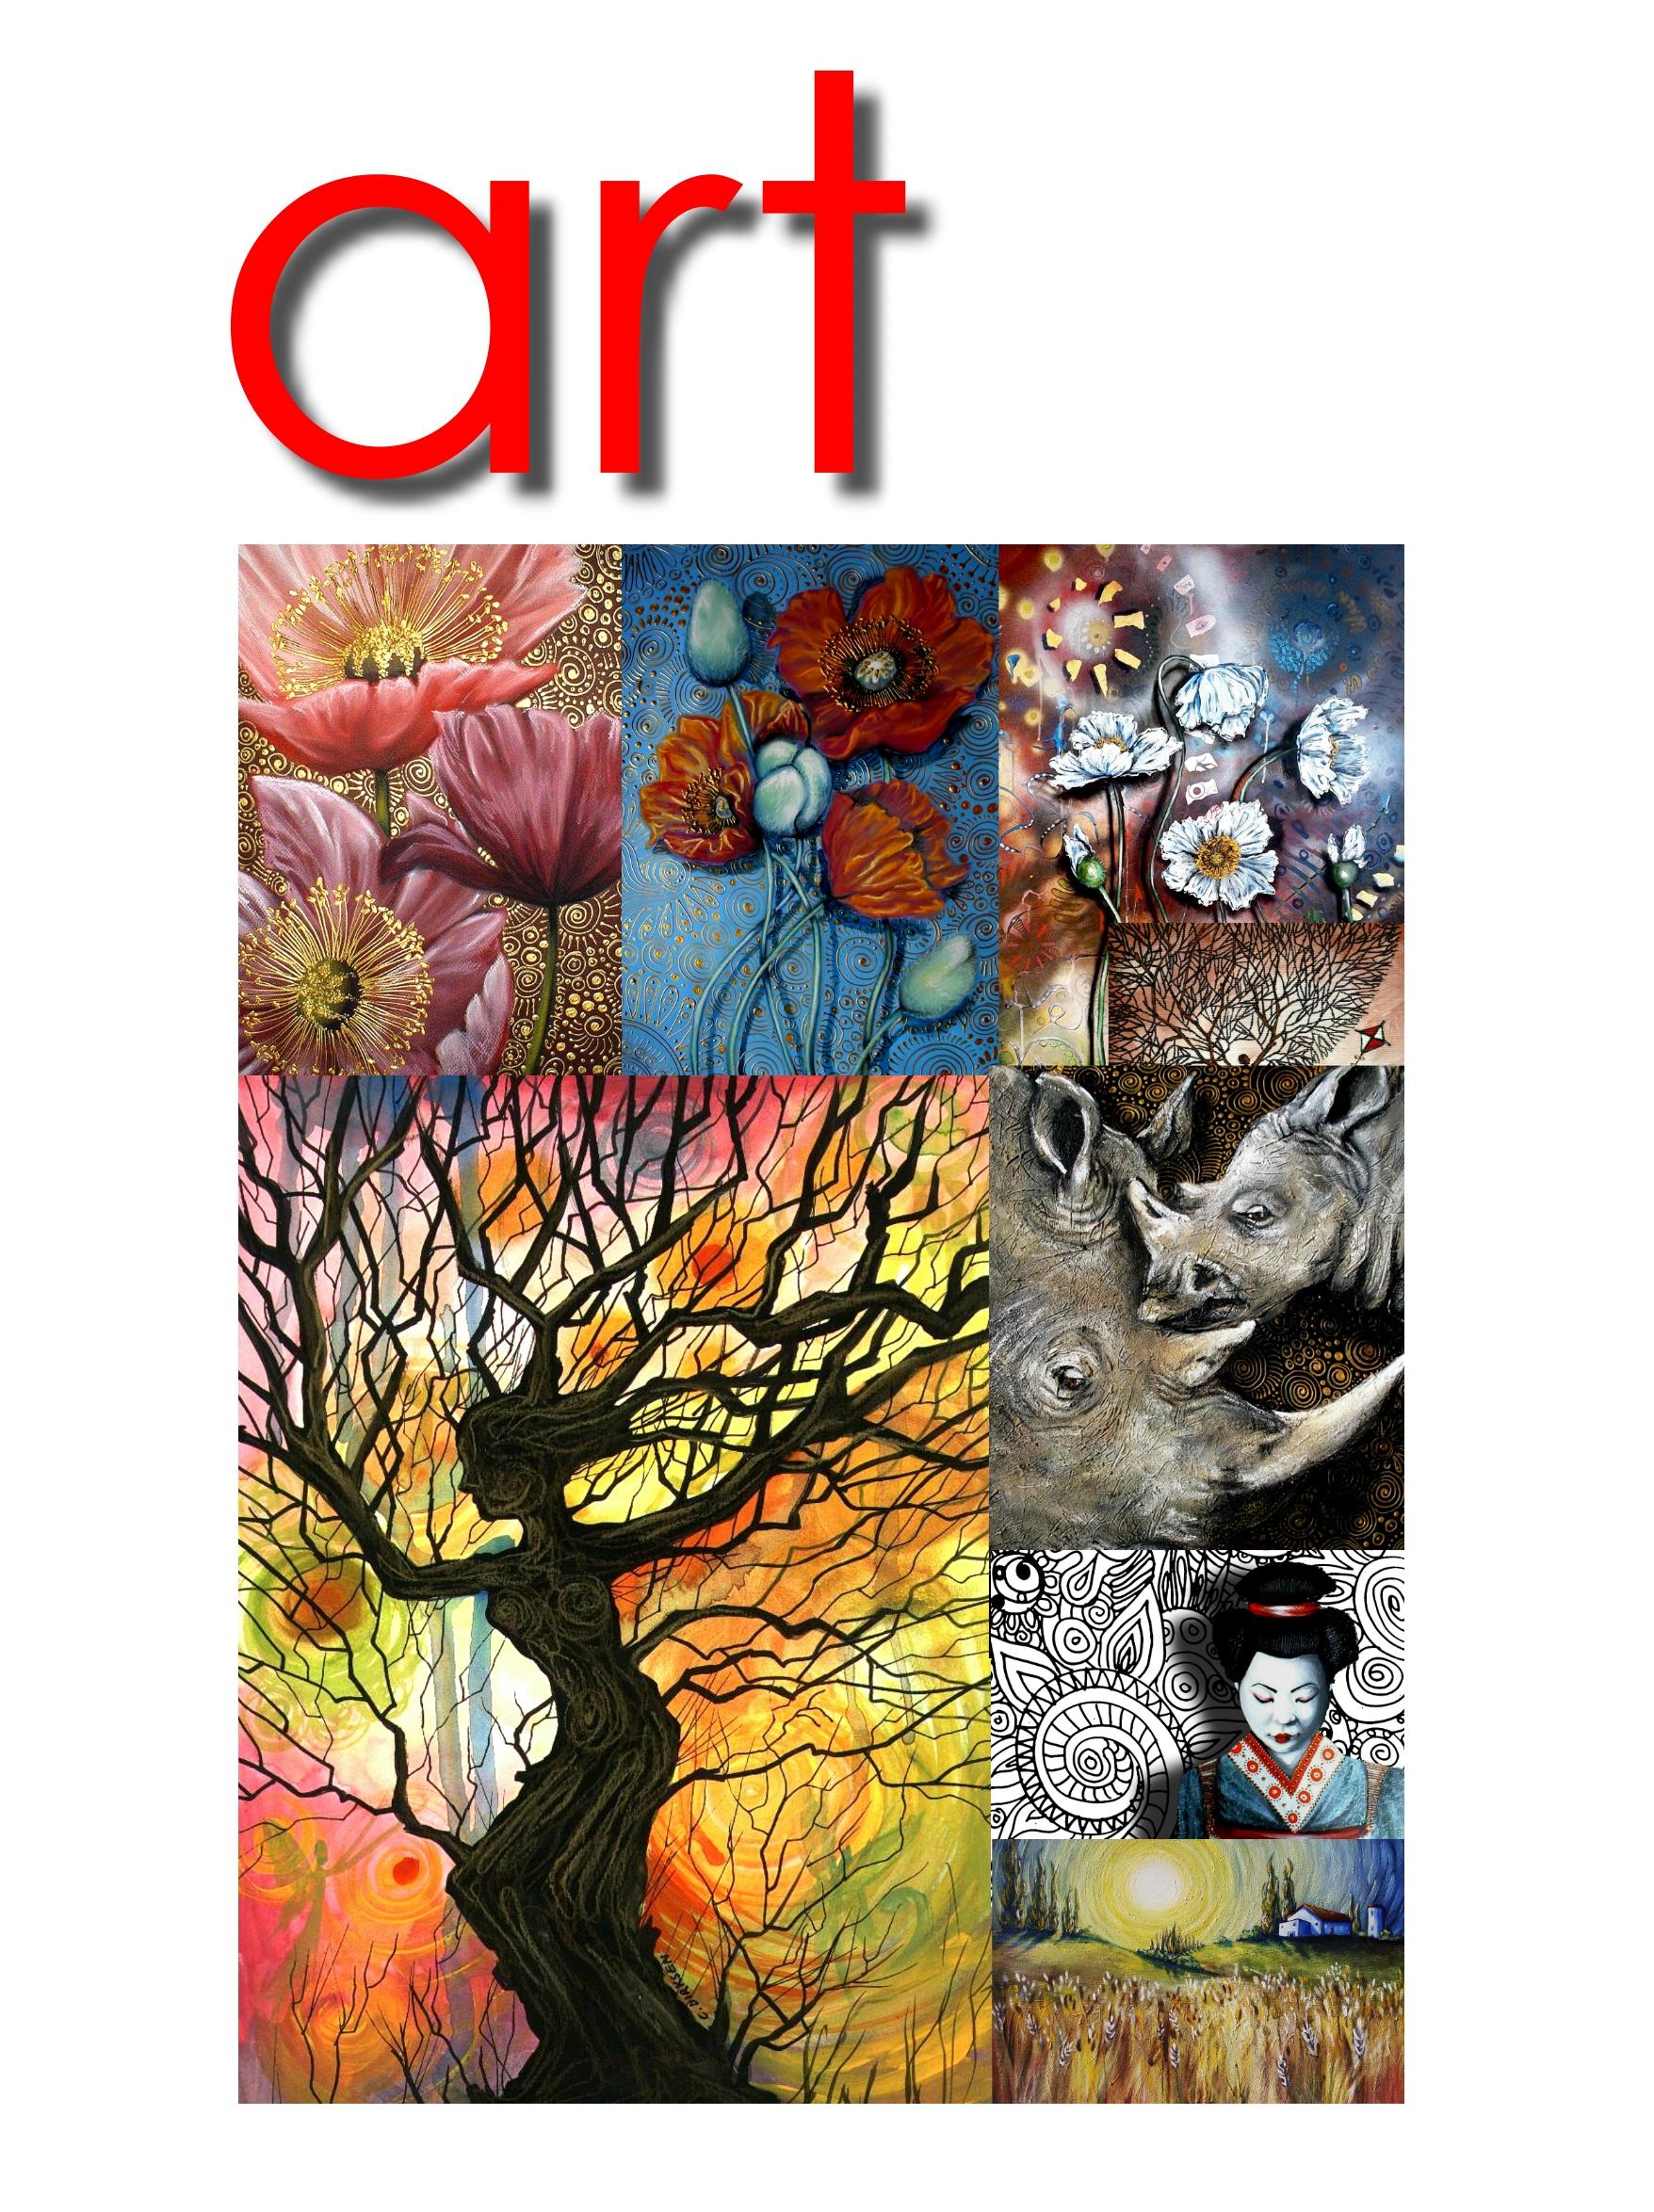 Artwork Collage Cherie Roe Dirksen